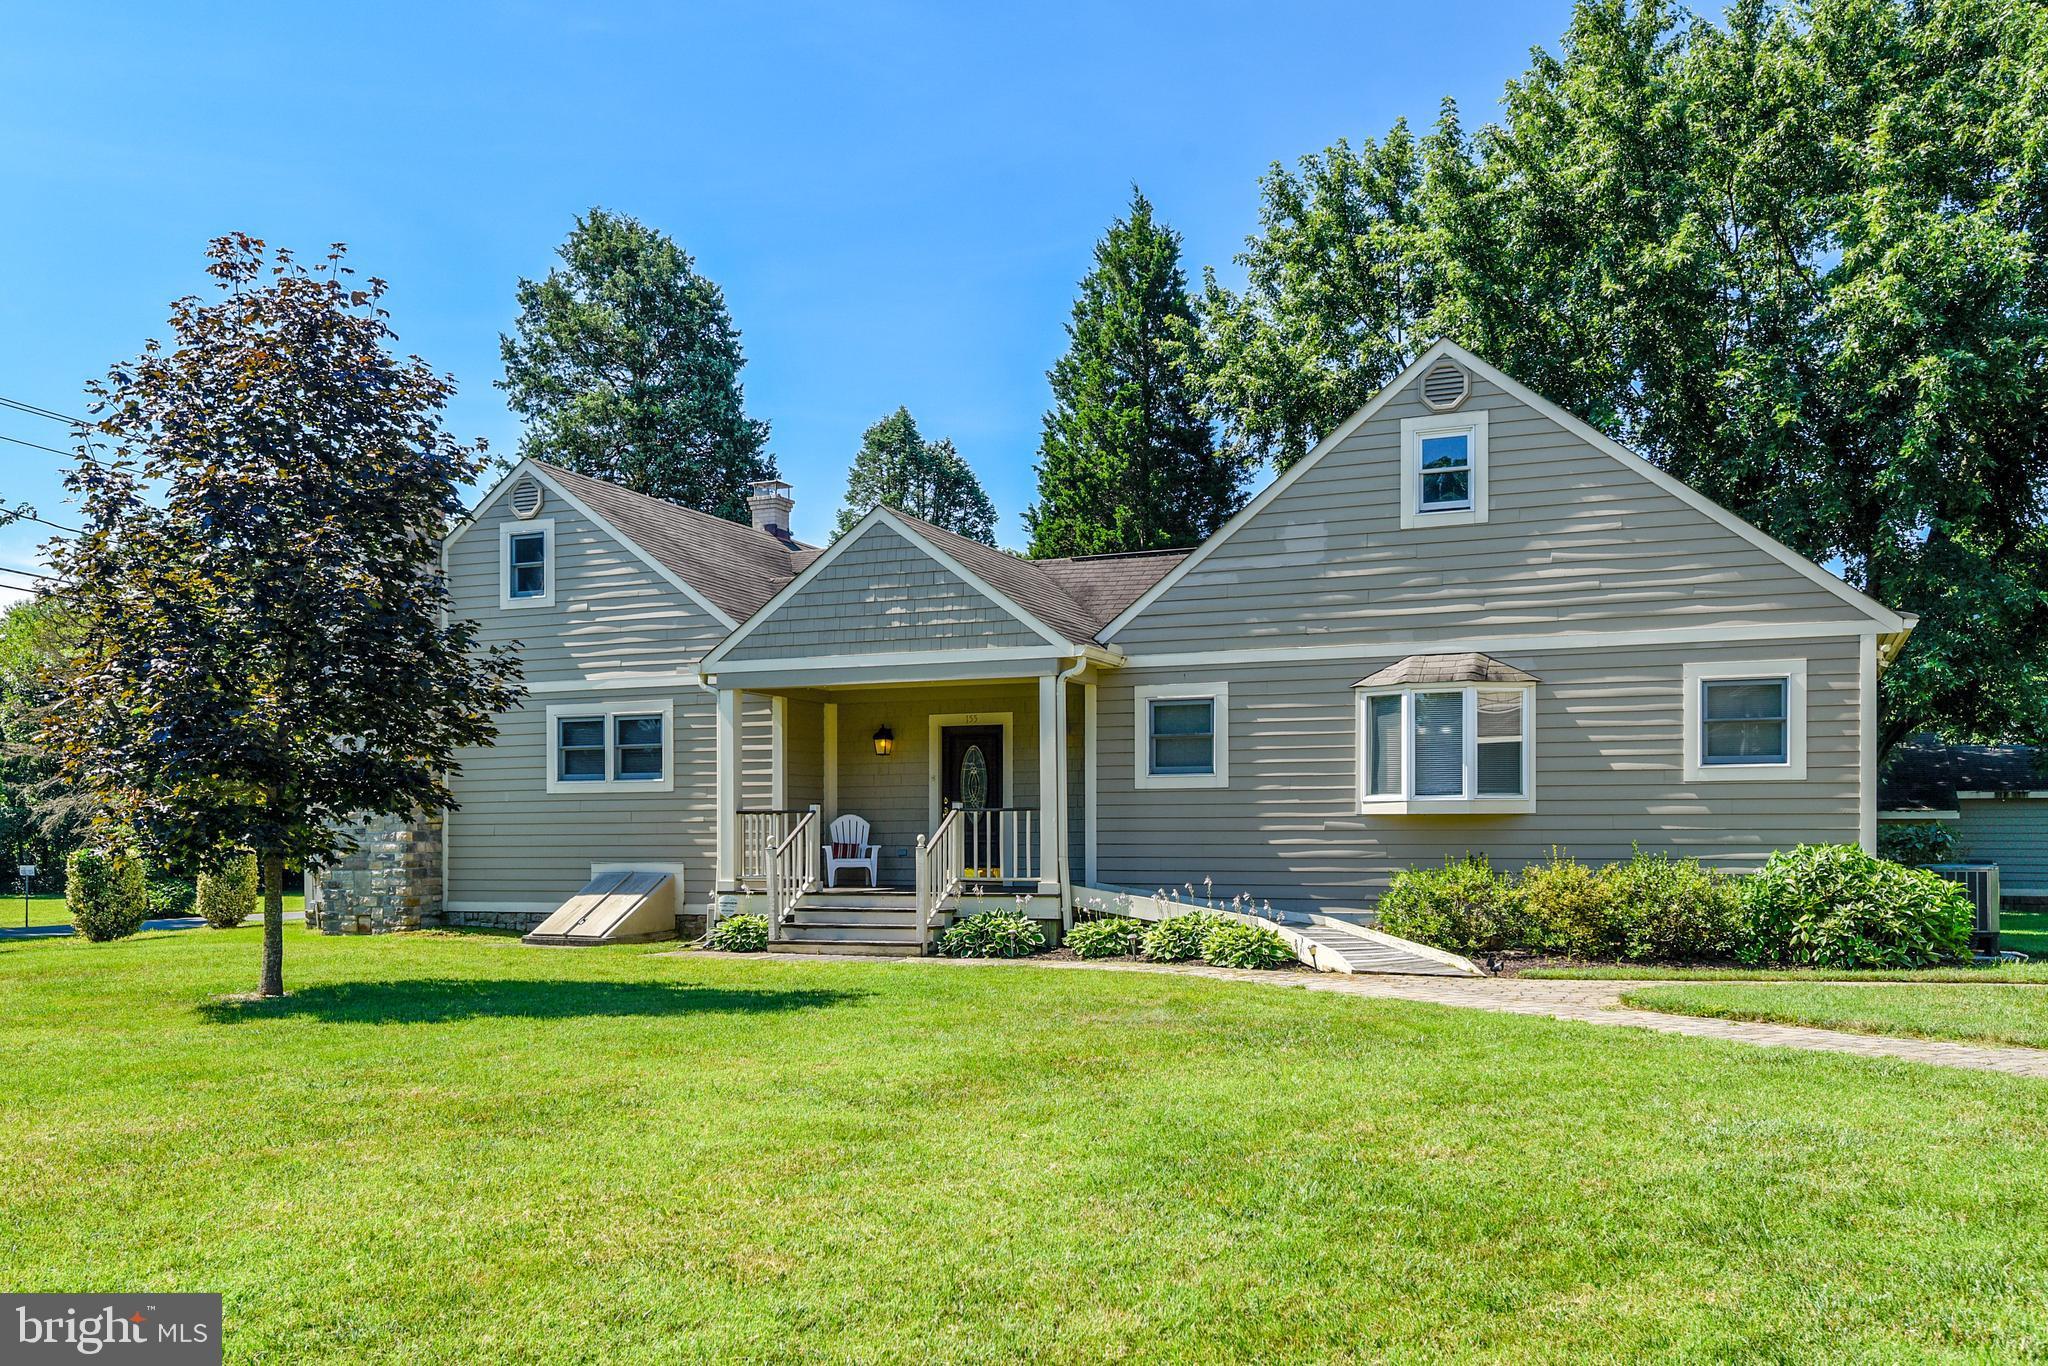 155 Truck House Rd, Severna Park, MD, 21146